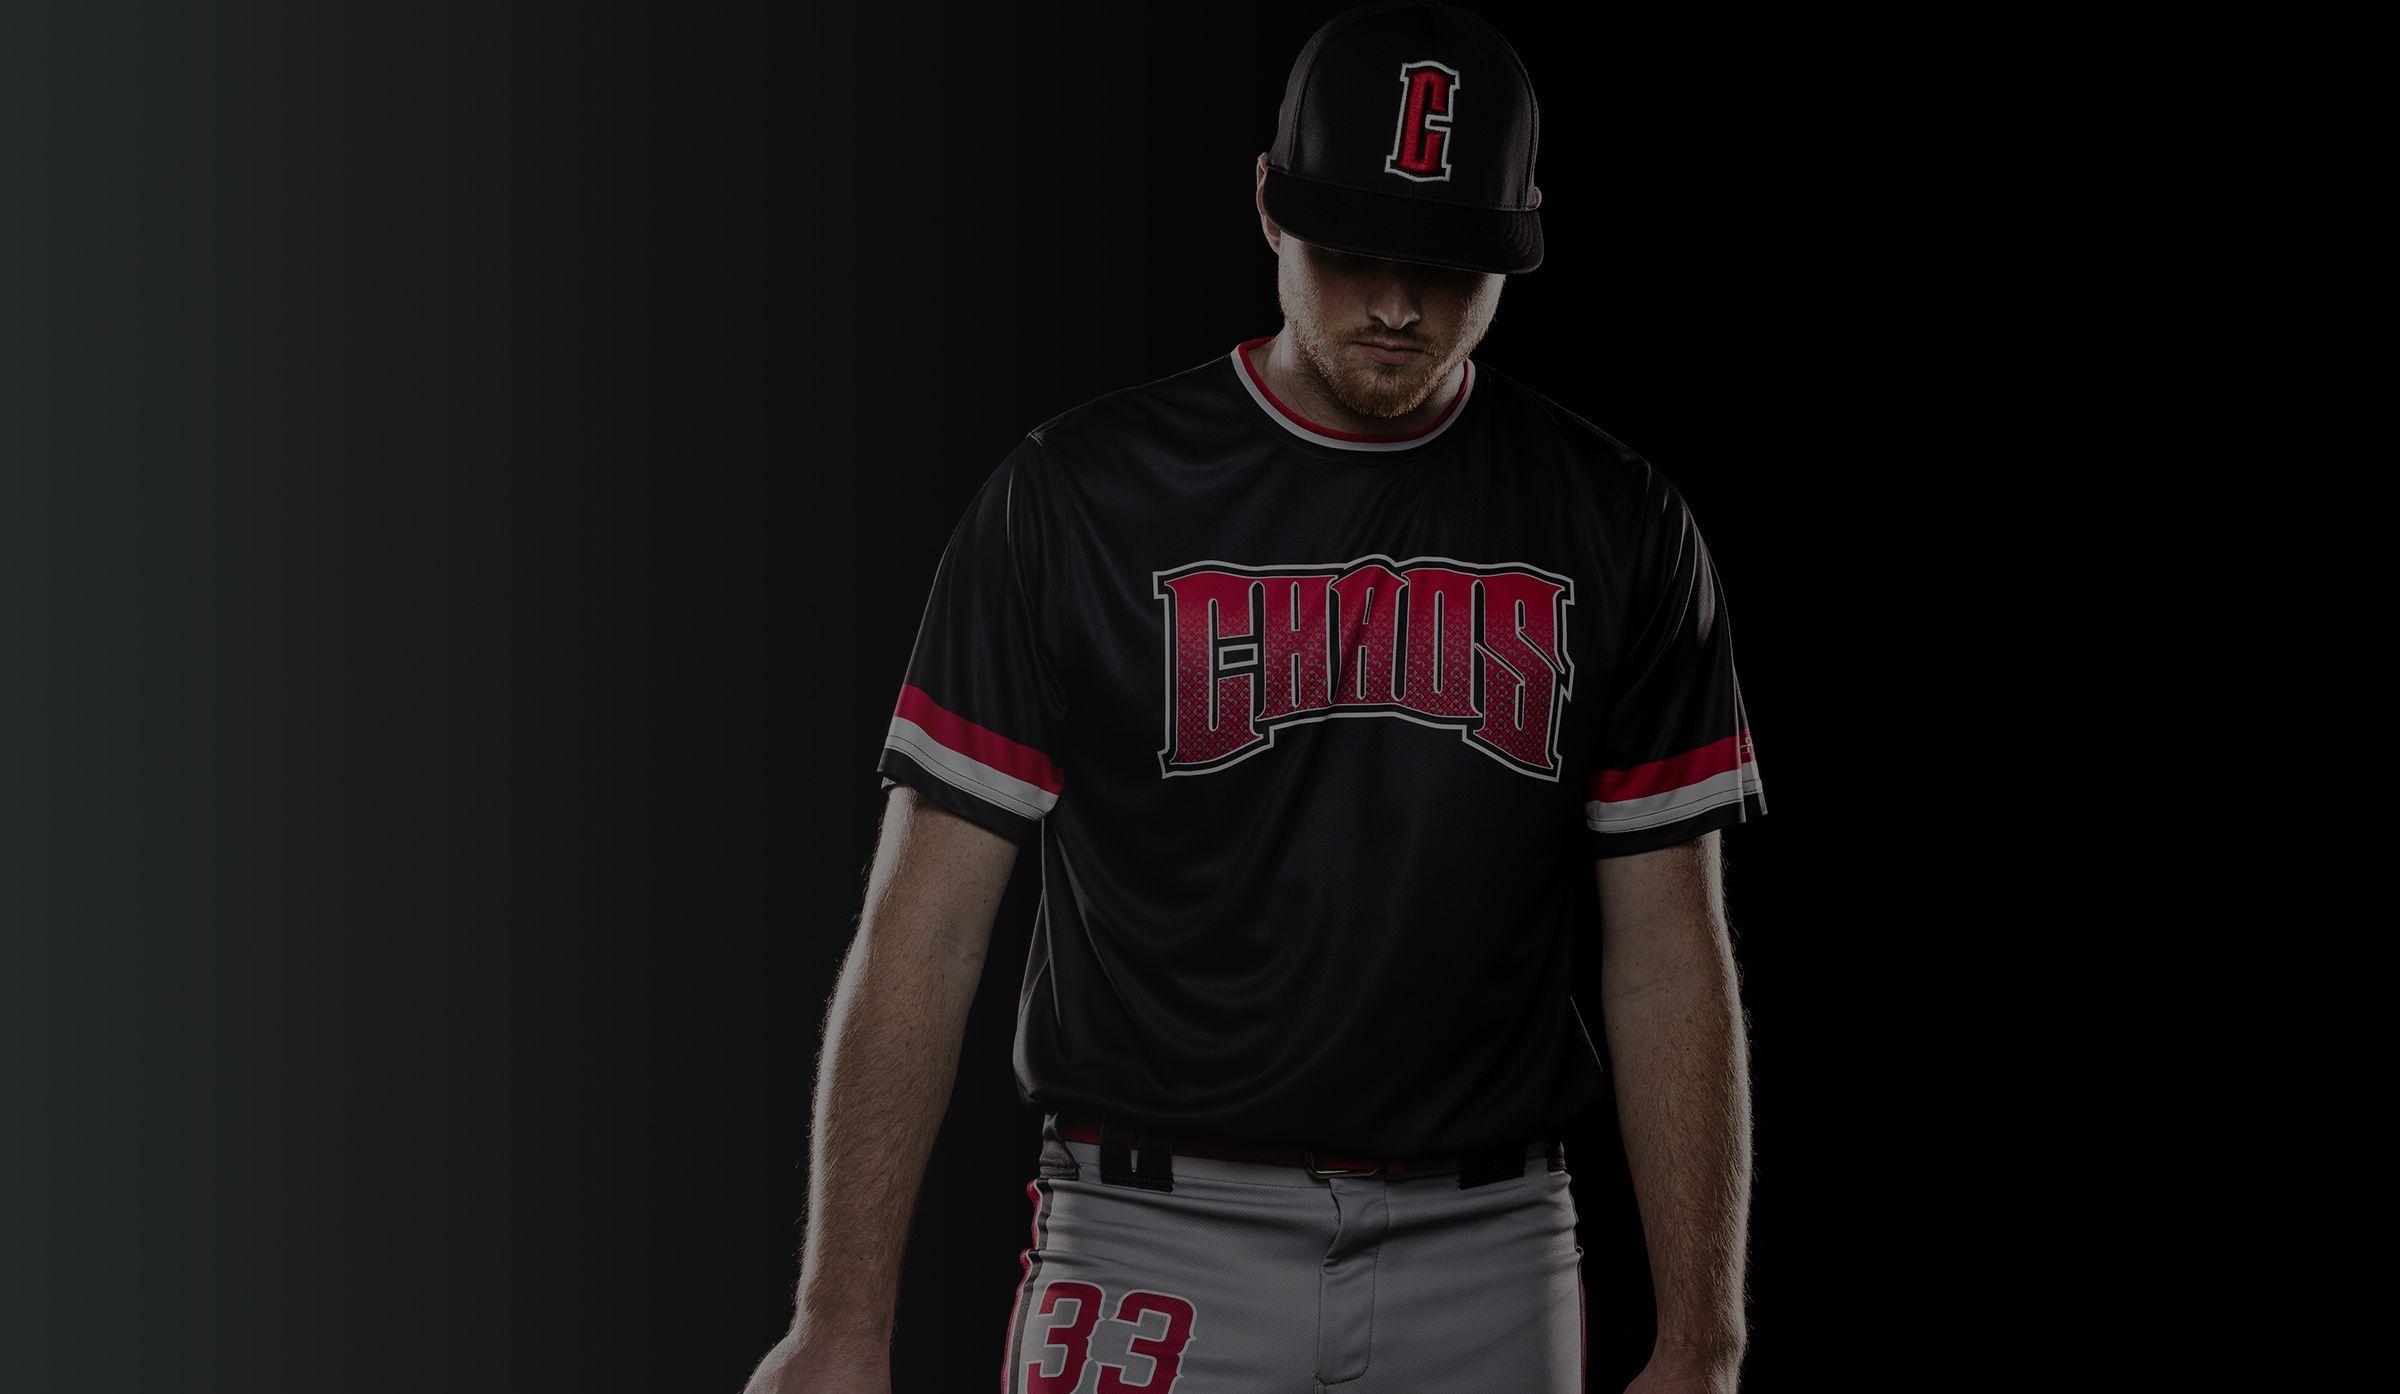 bb0623bc2ce Custom Uniforms   Jerseys